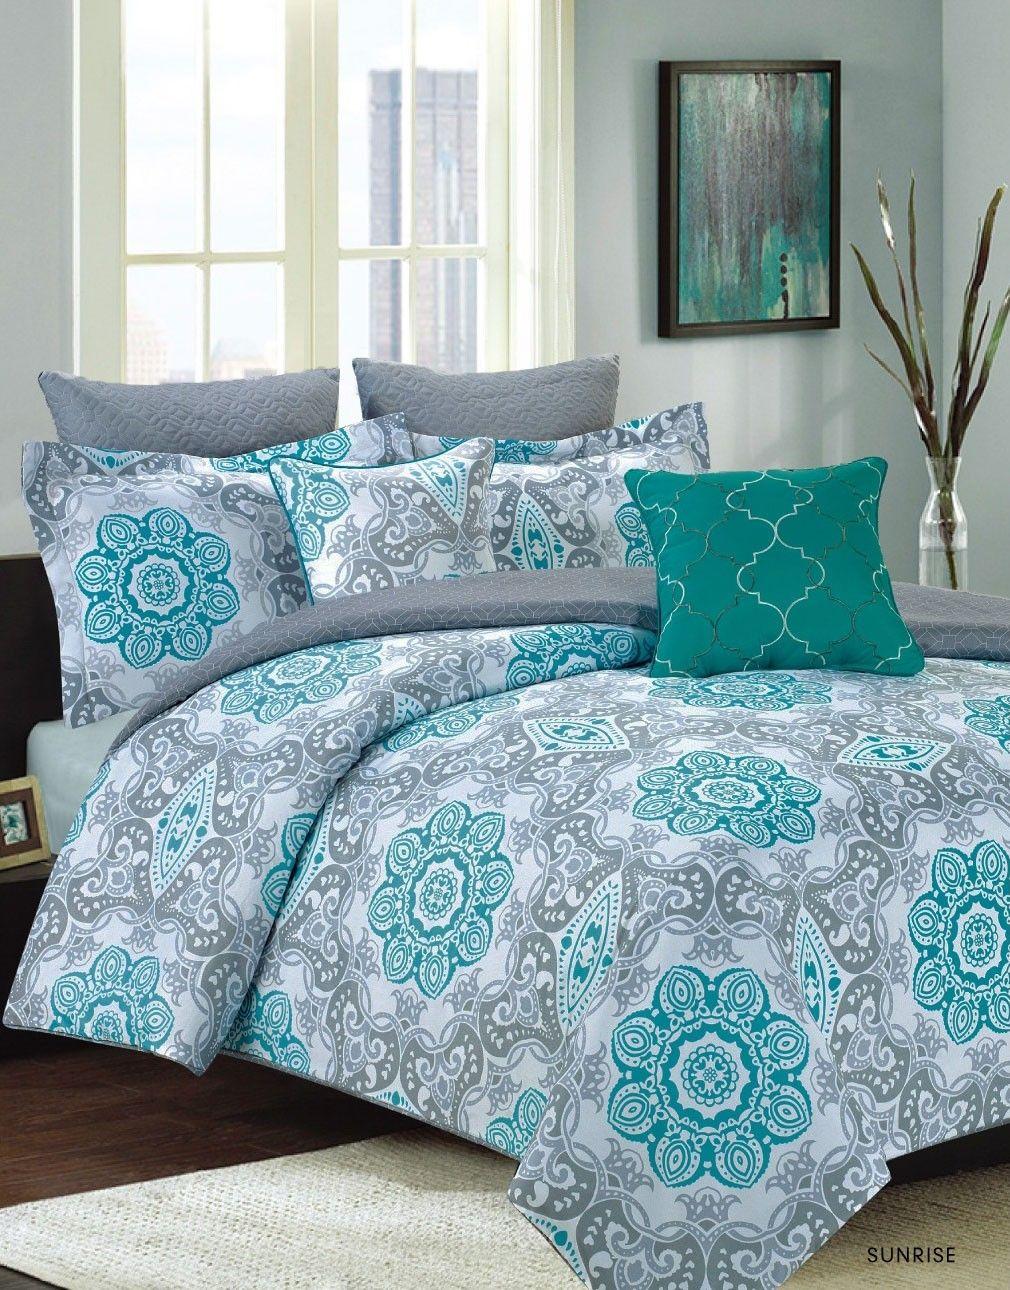 Crest Home Sunrise King Size Bedding forter 7 Pc Bed